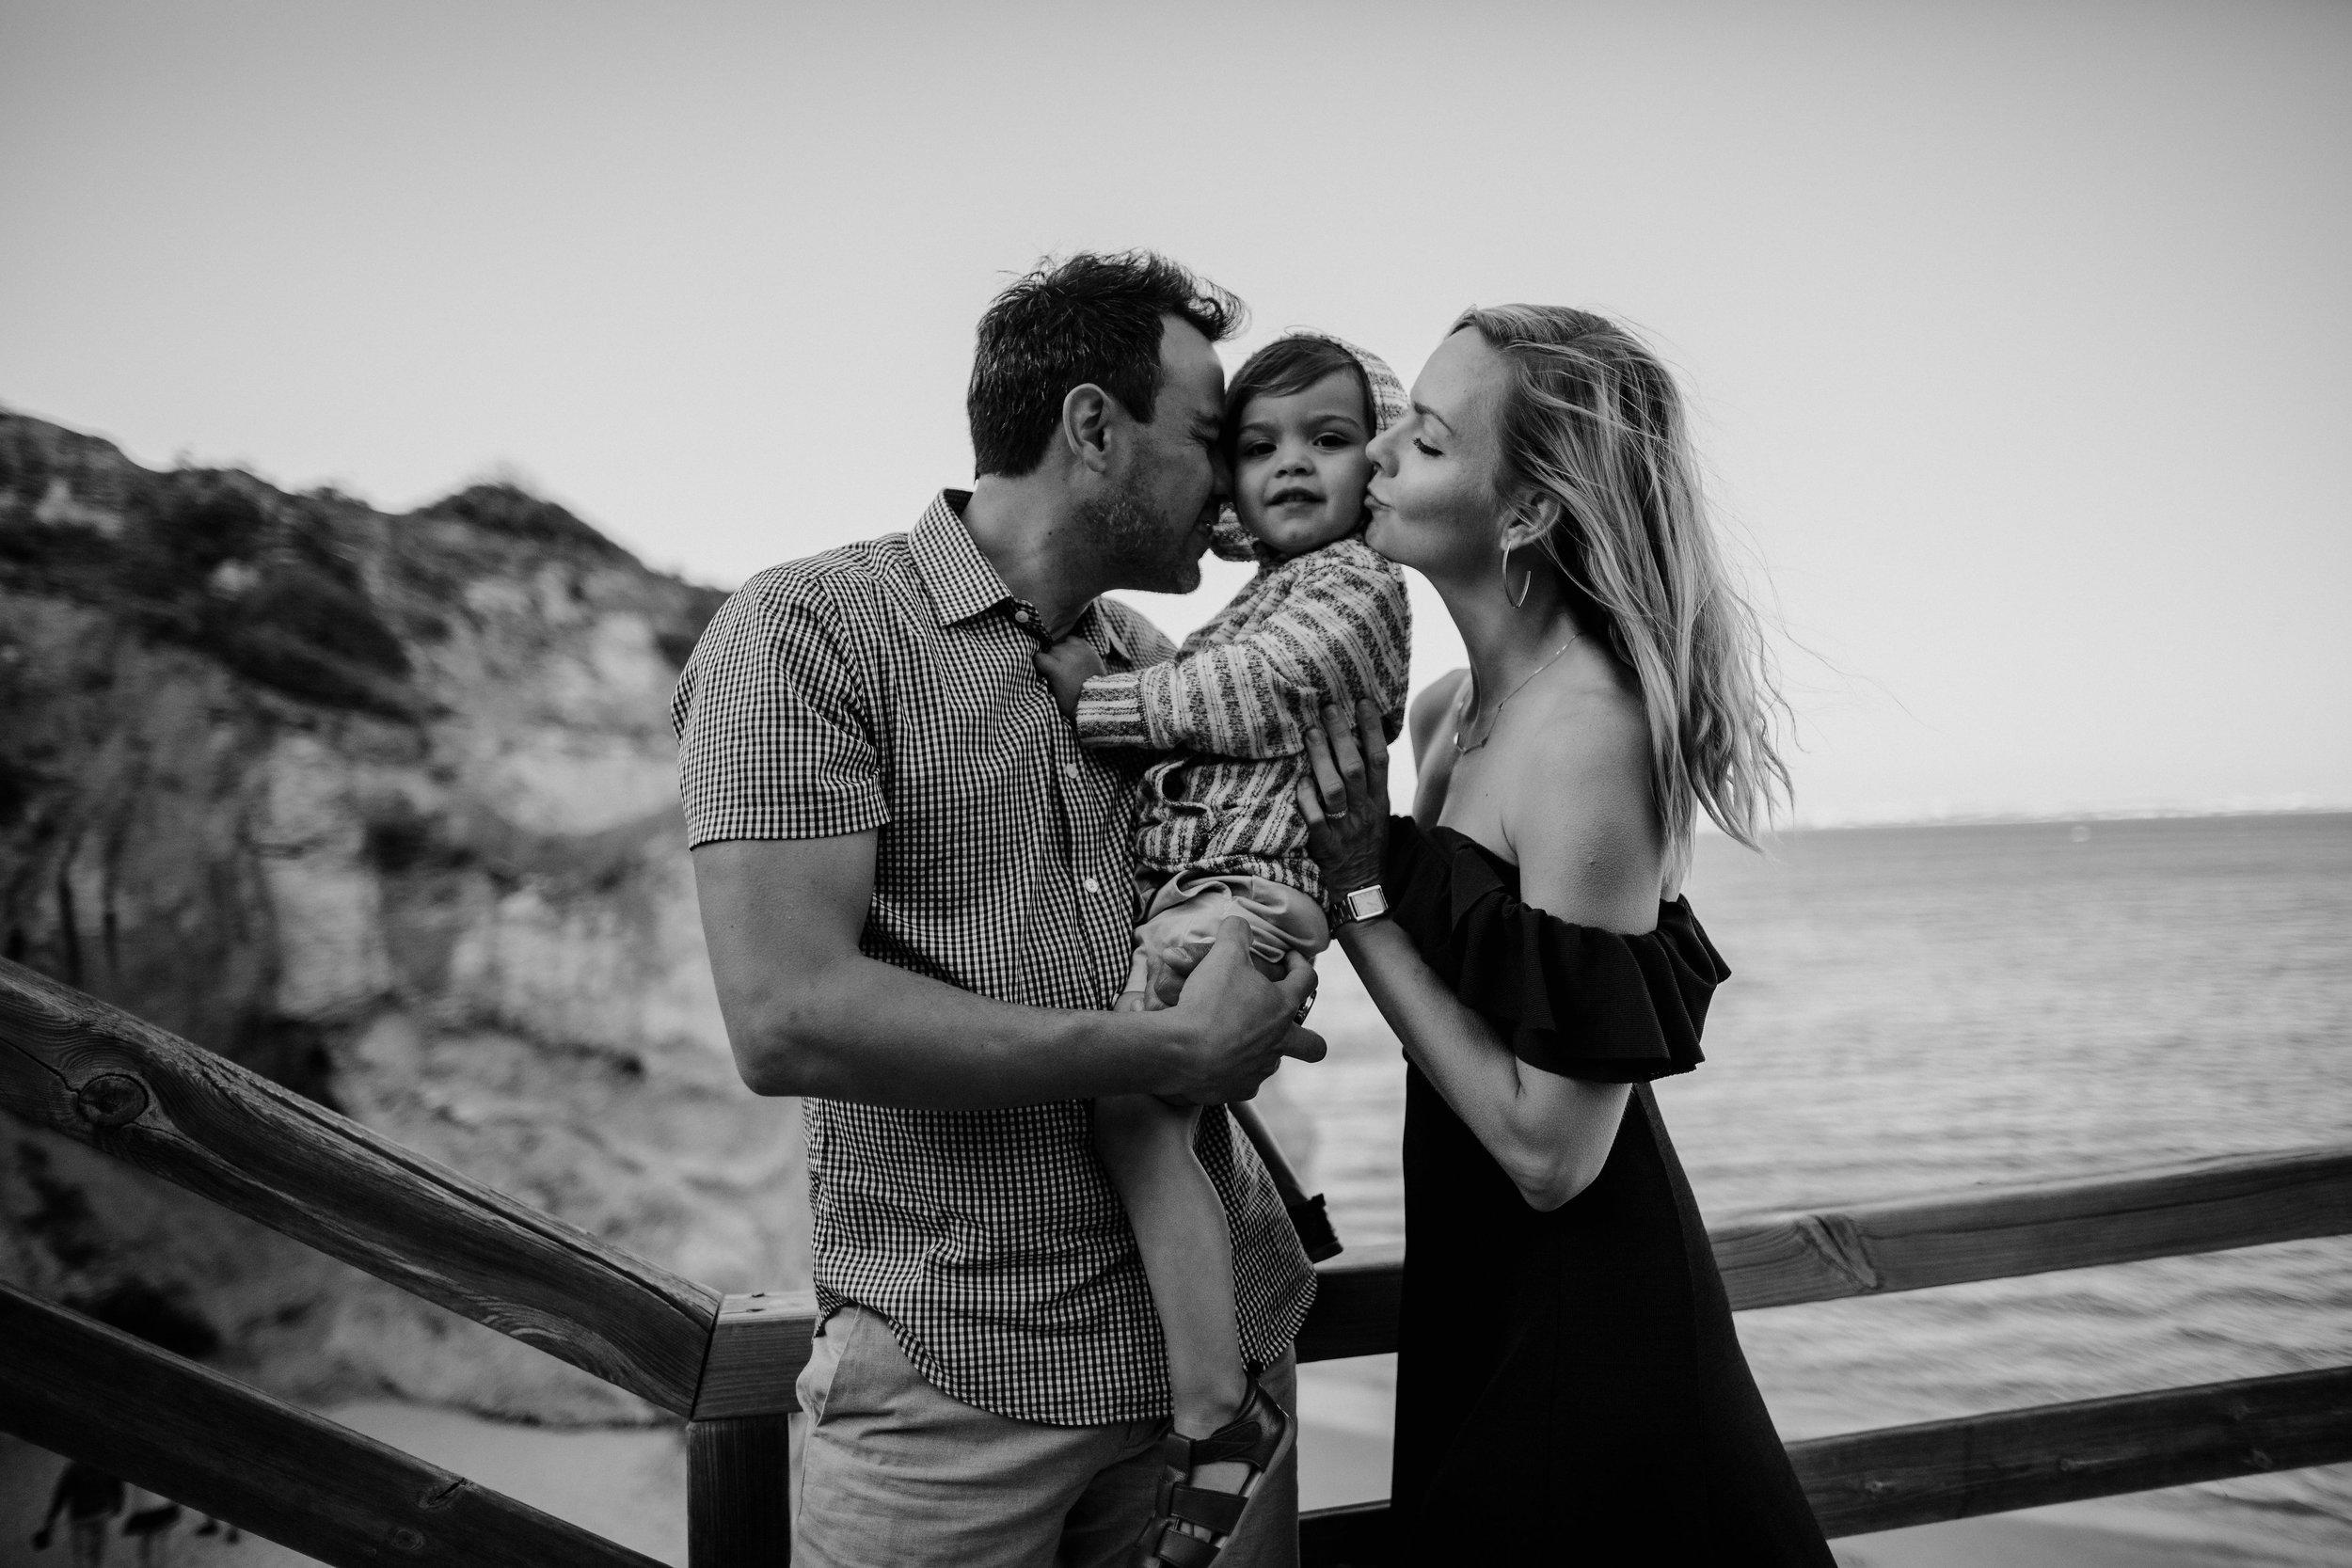 Lapela-Family-photography-Lagos-Algarve23.jpg